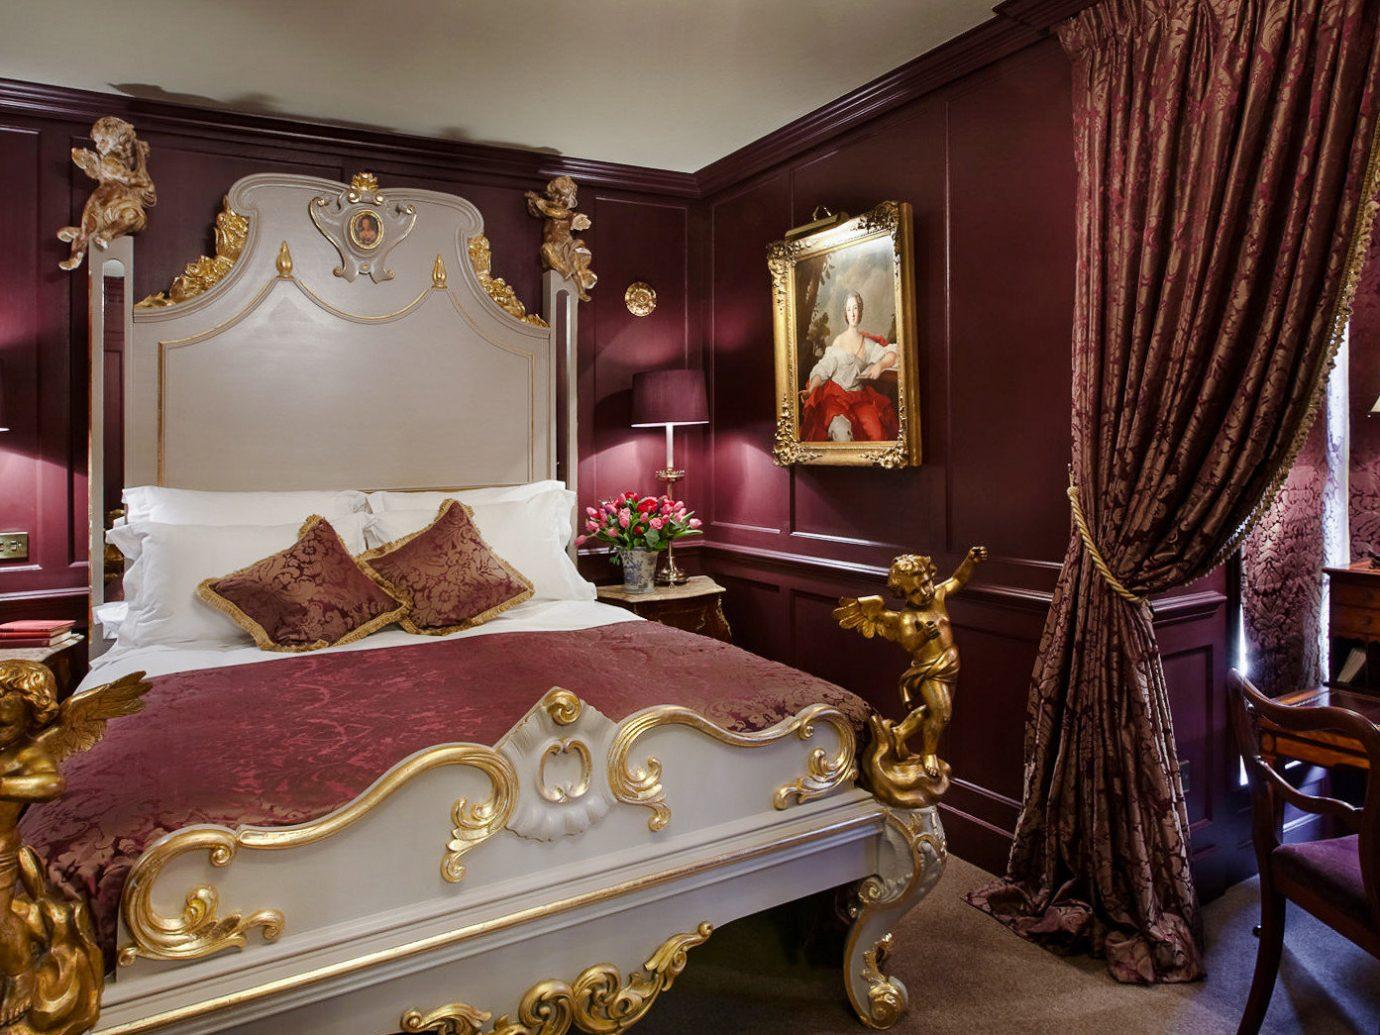 Boutique Hotels London Romantic Hotels room indoor furniture Suite interior design Bedroom home bed Classic estate bed frame bed sheet decorated several